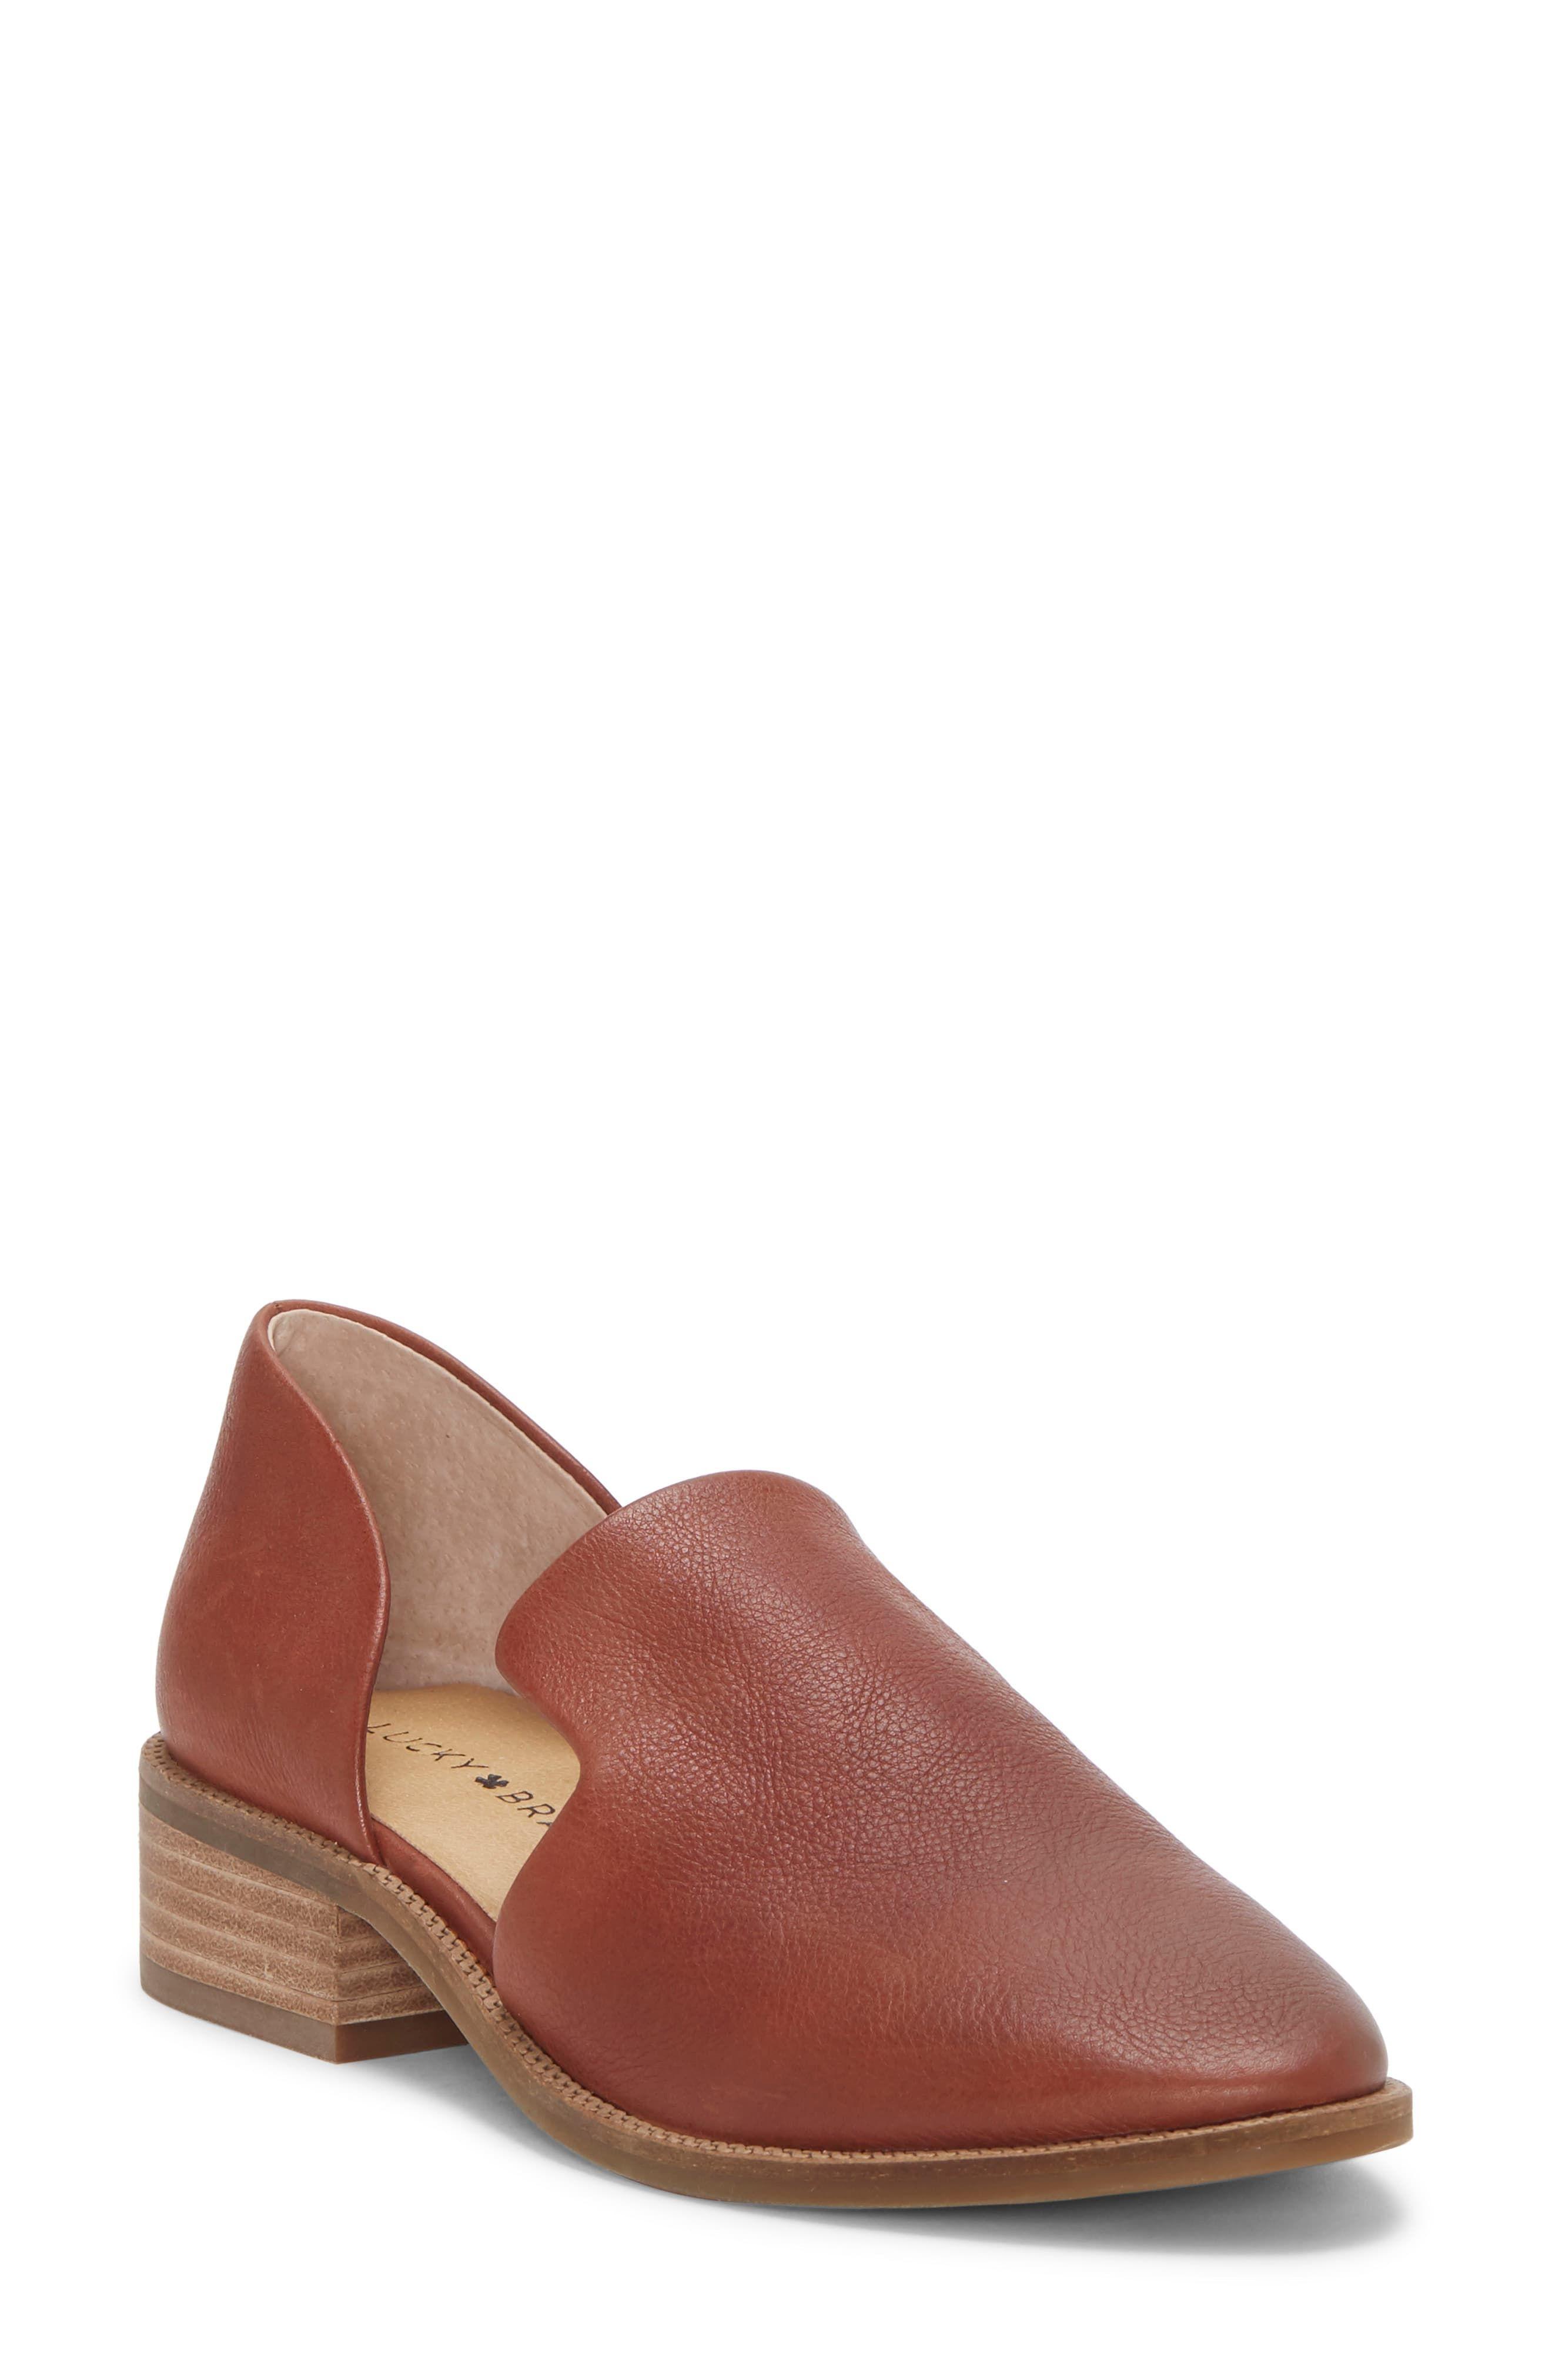 Women's Lucky Brand Boots   Nordstrom